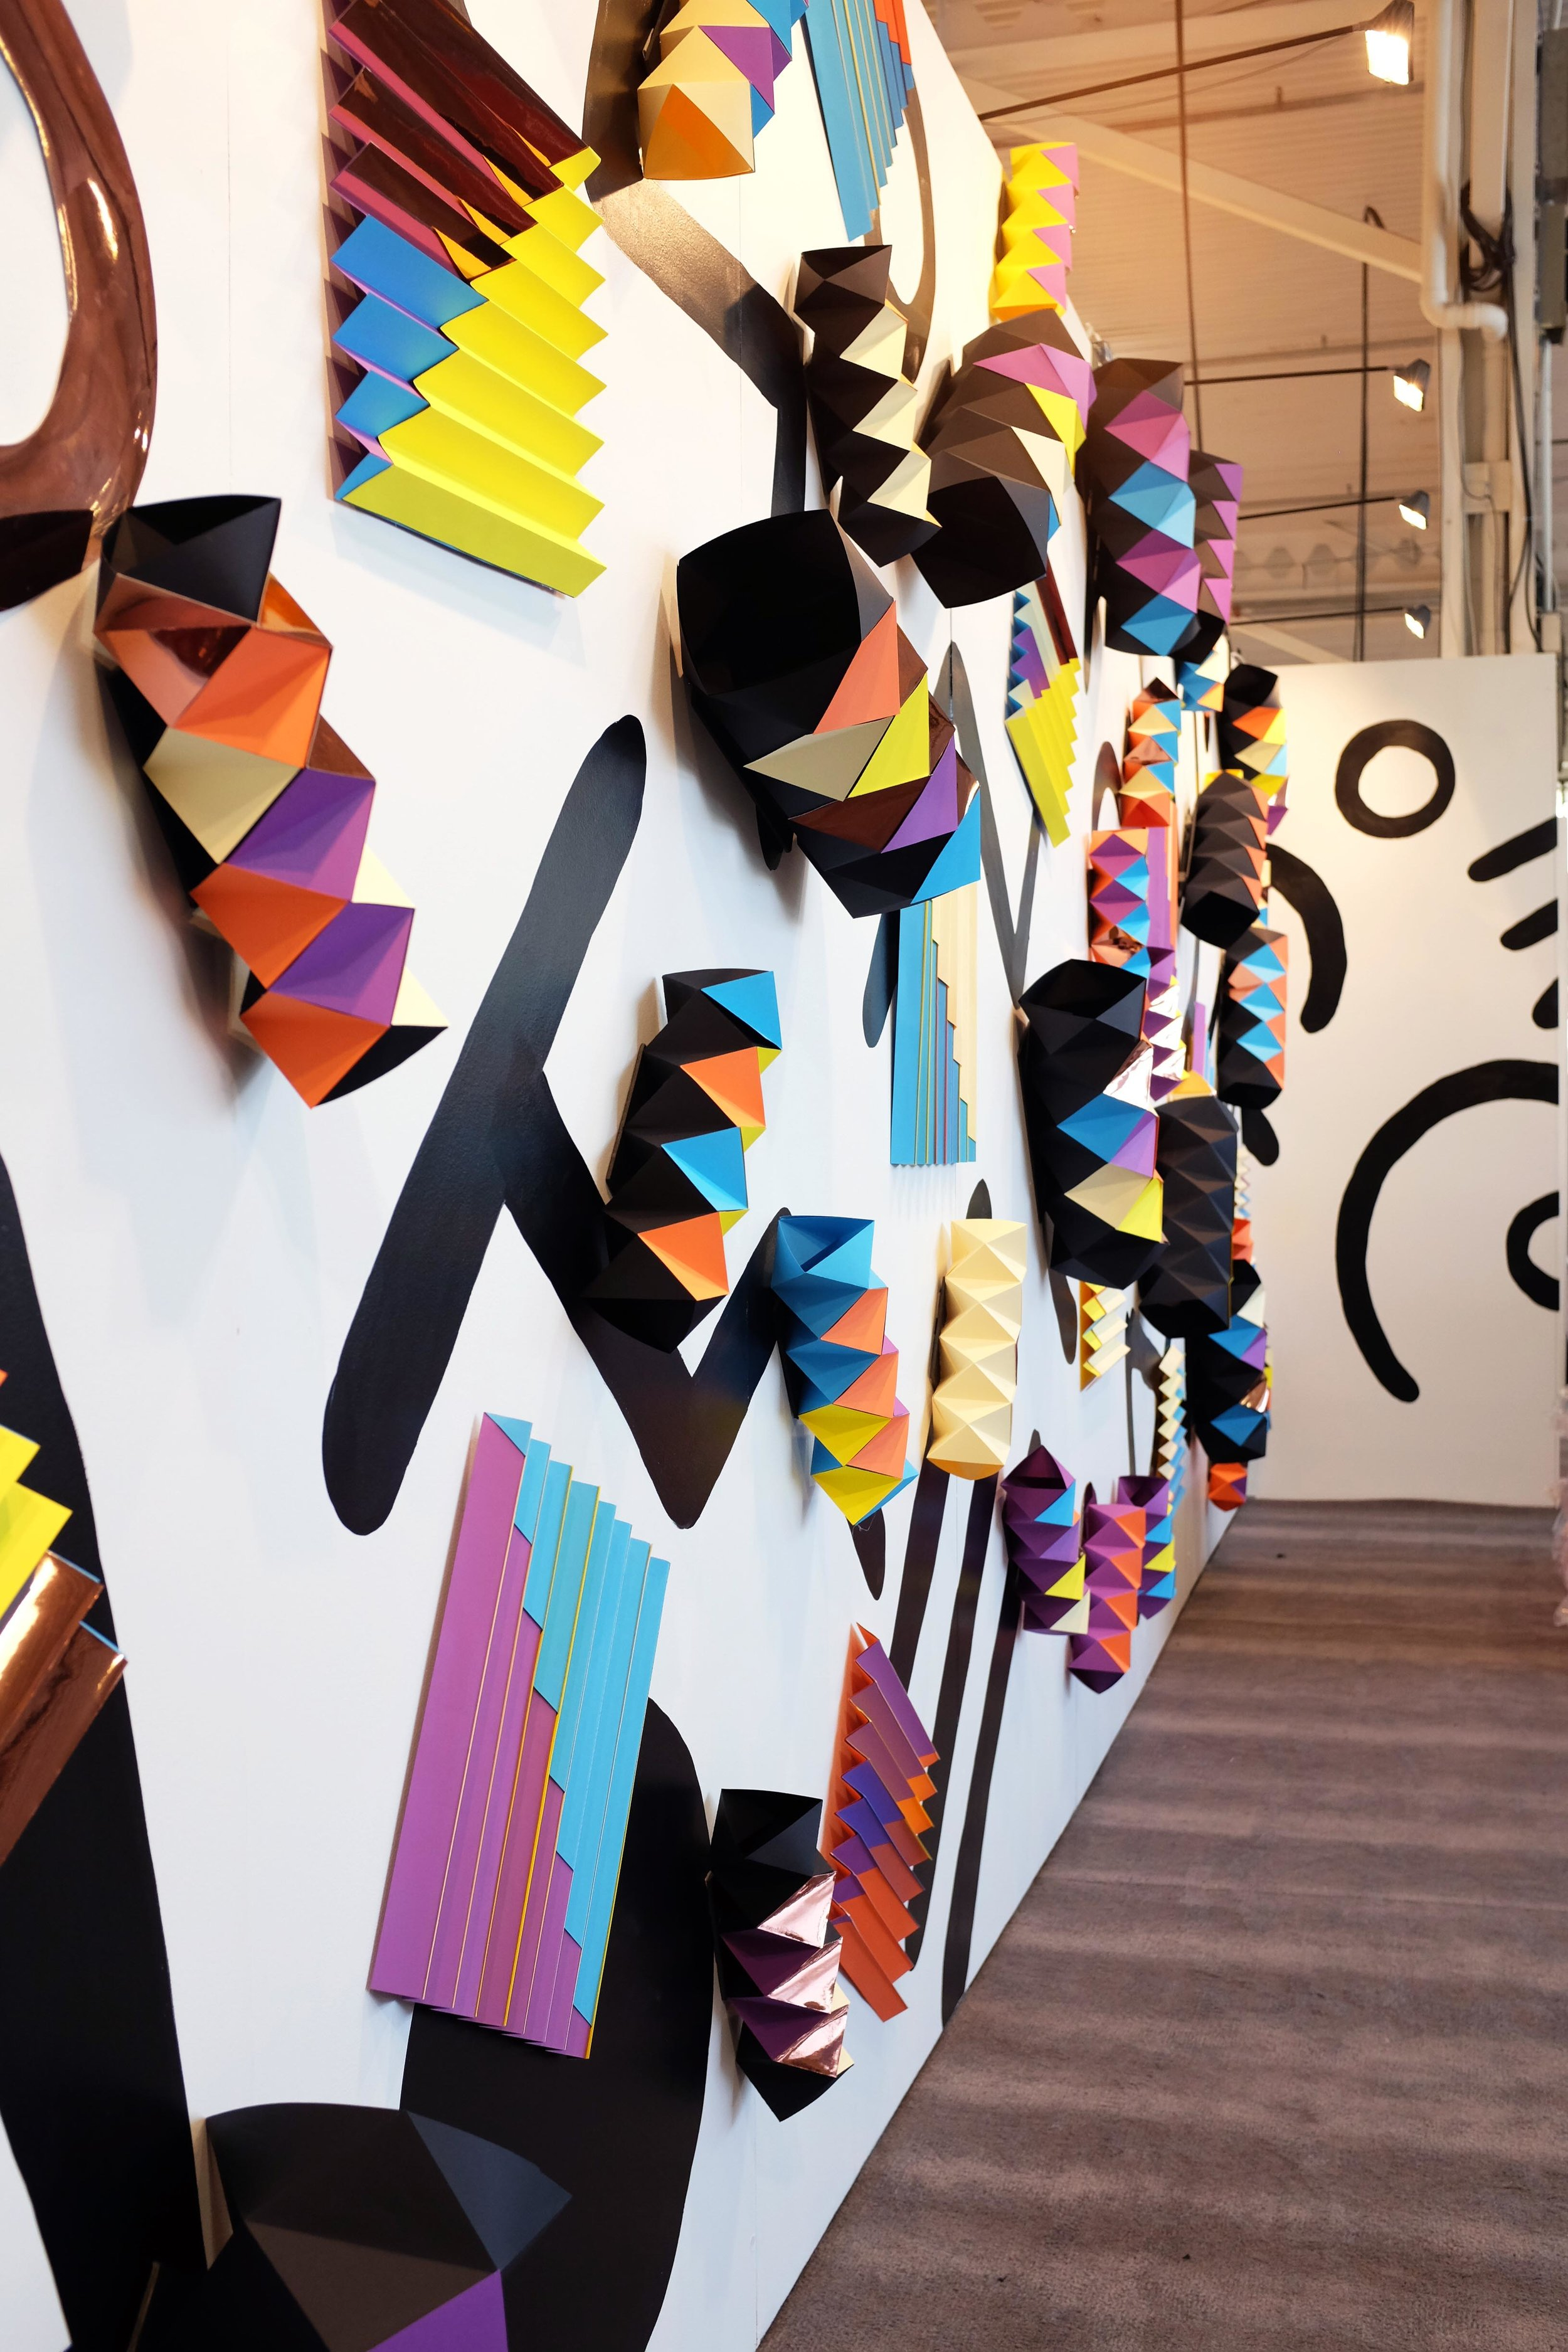 miss-cloudy-pauline-loctin-artist-project-2019-paper-art-origami-entrance-toronto-6.jpg